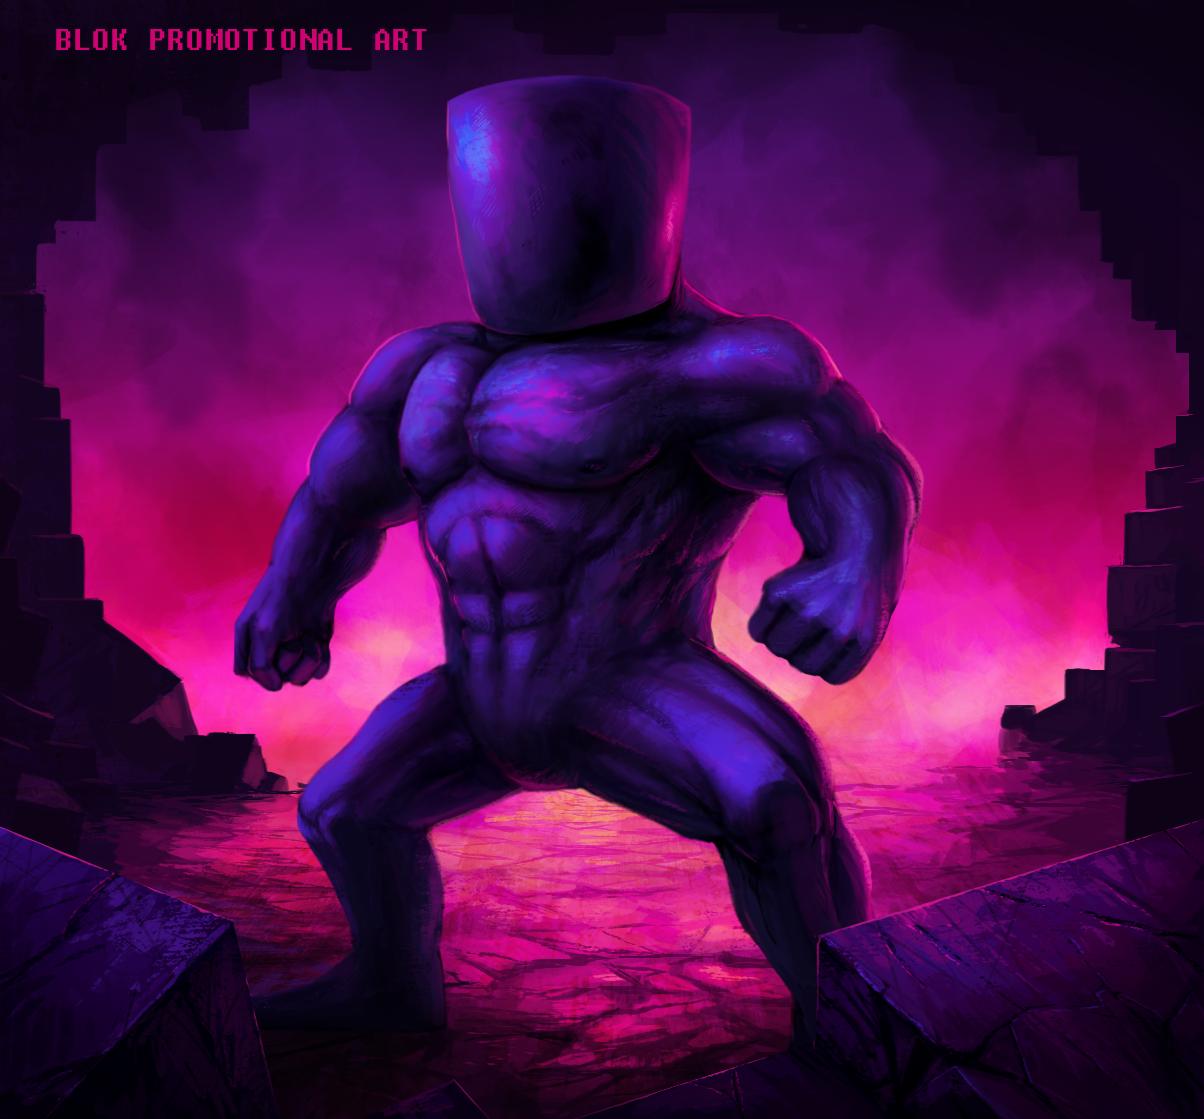 BLOK Promotional Art